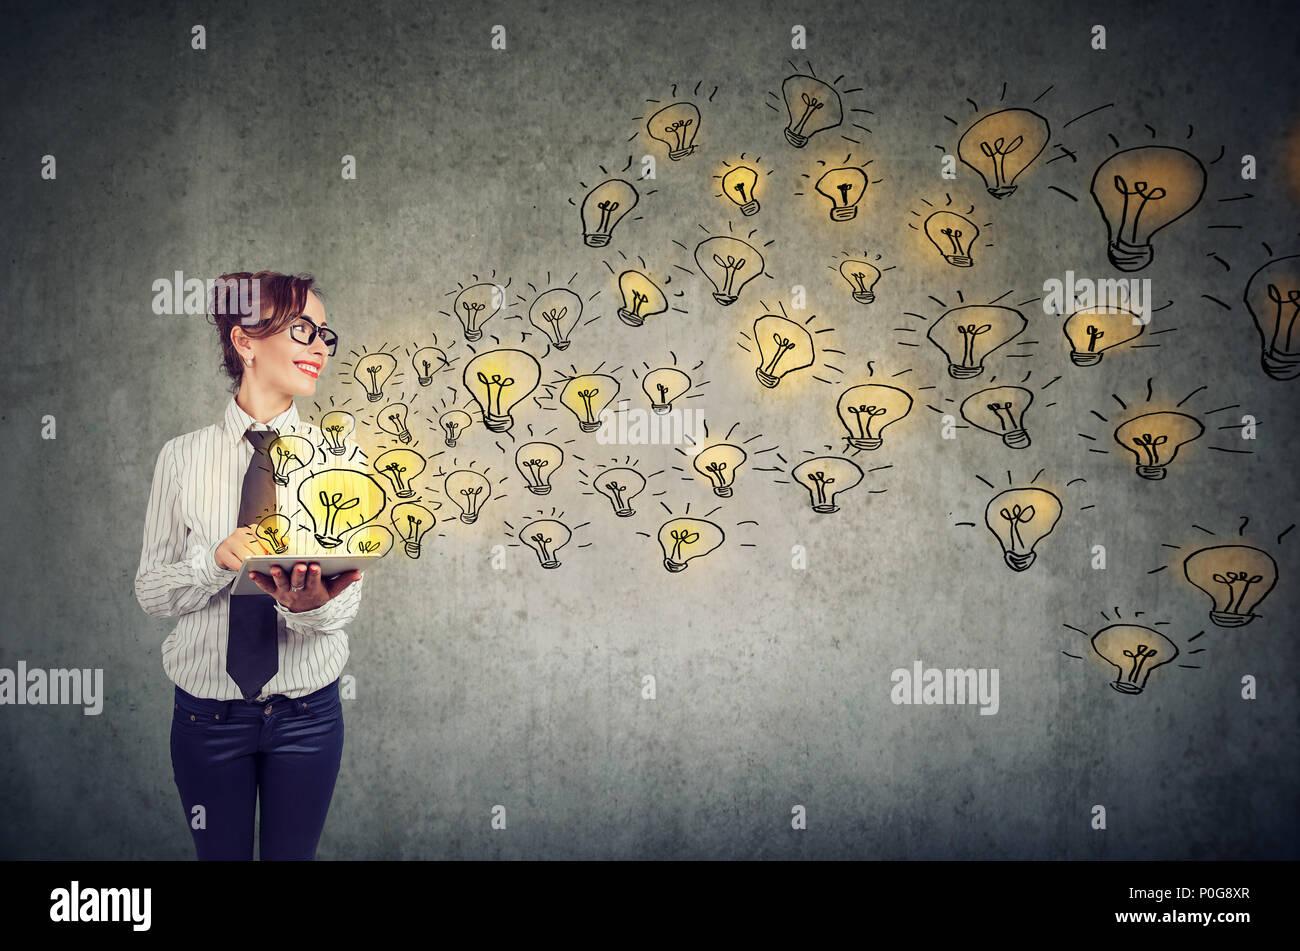 Seitenansicht des Young Business woman holding Tablet Computer mit brillanten Ideen Stockbild